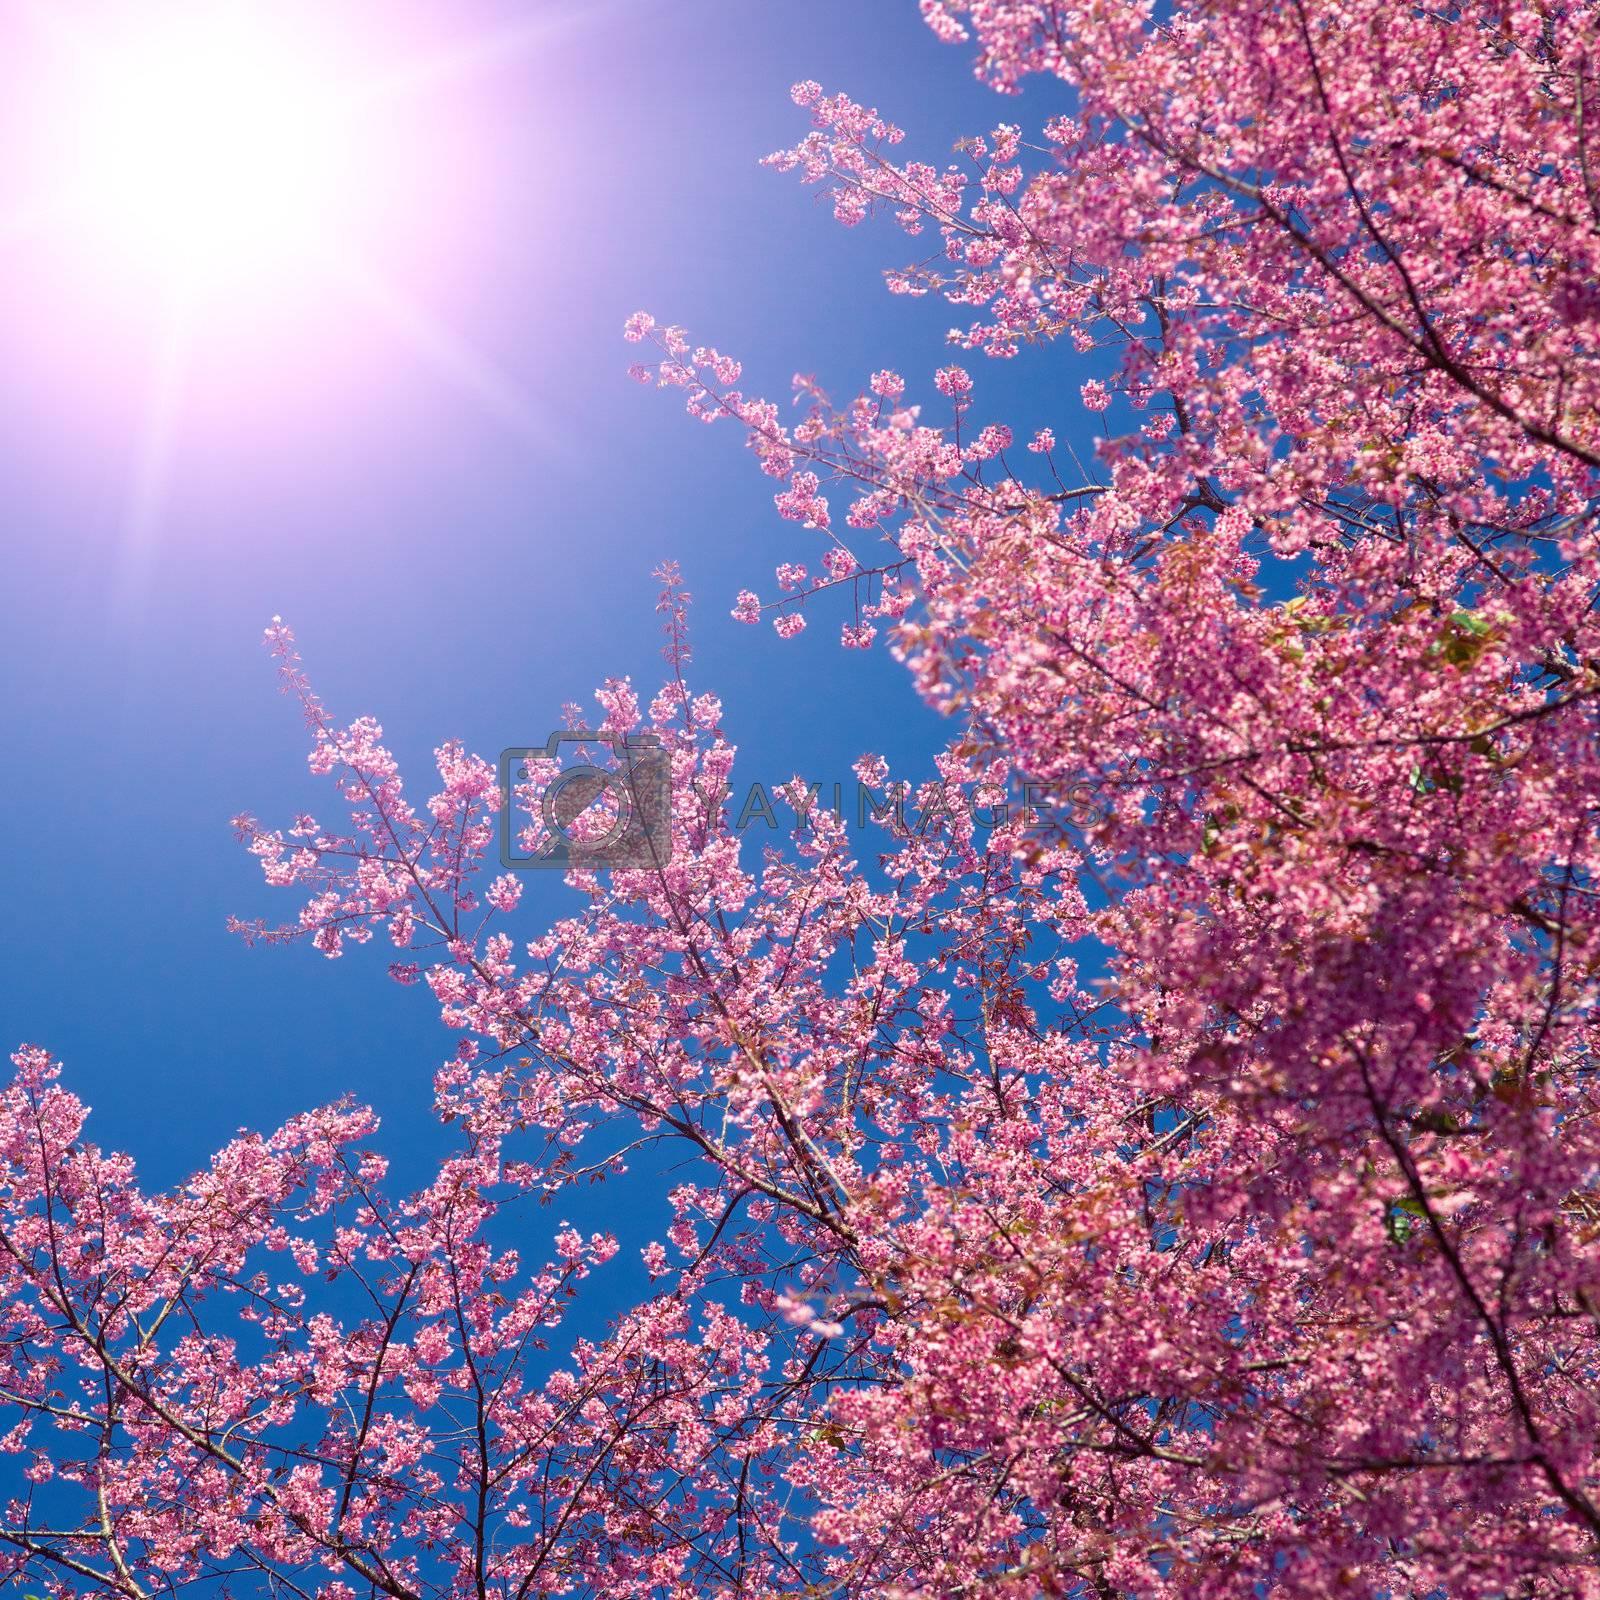 Blooming sakura on the blue sky background